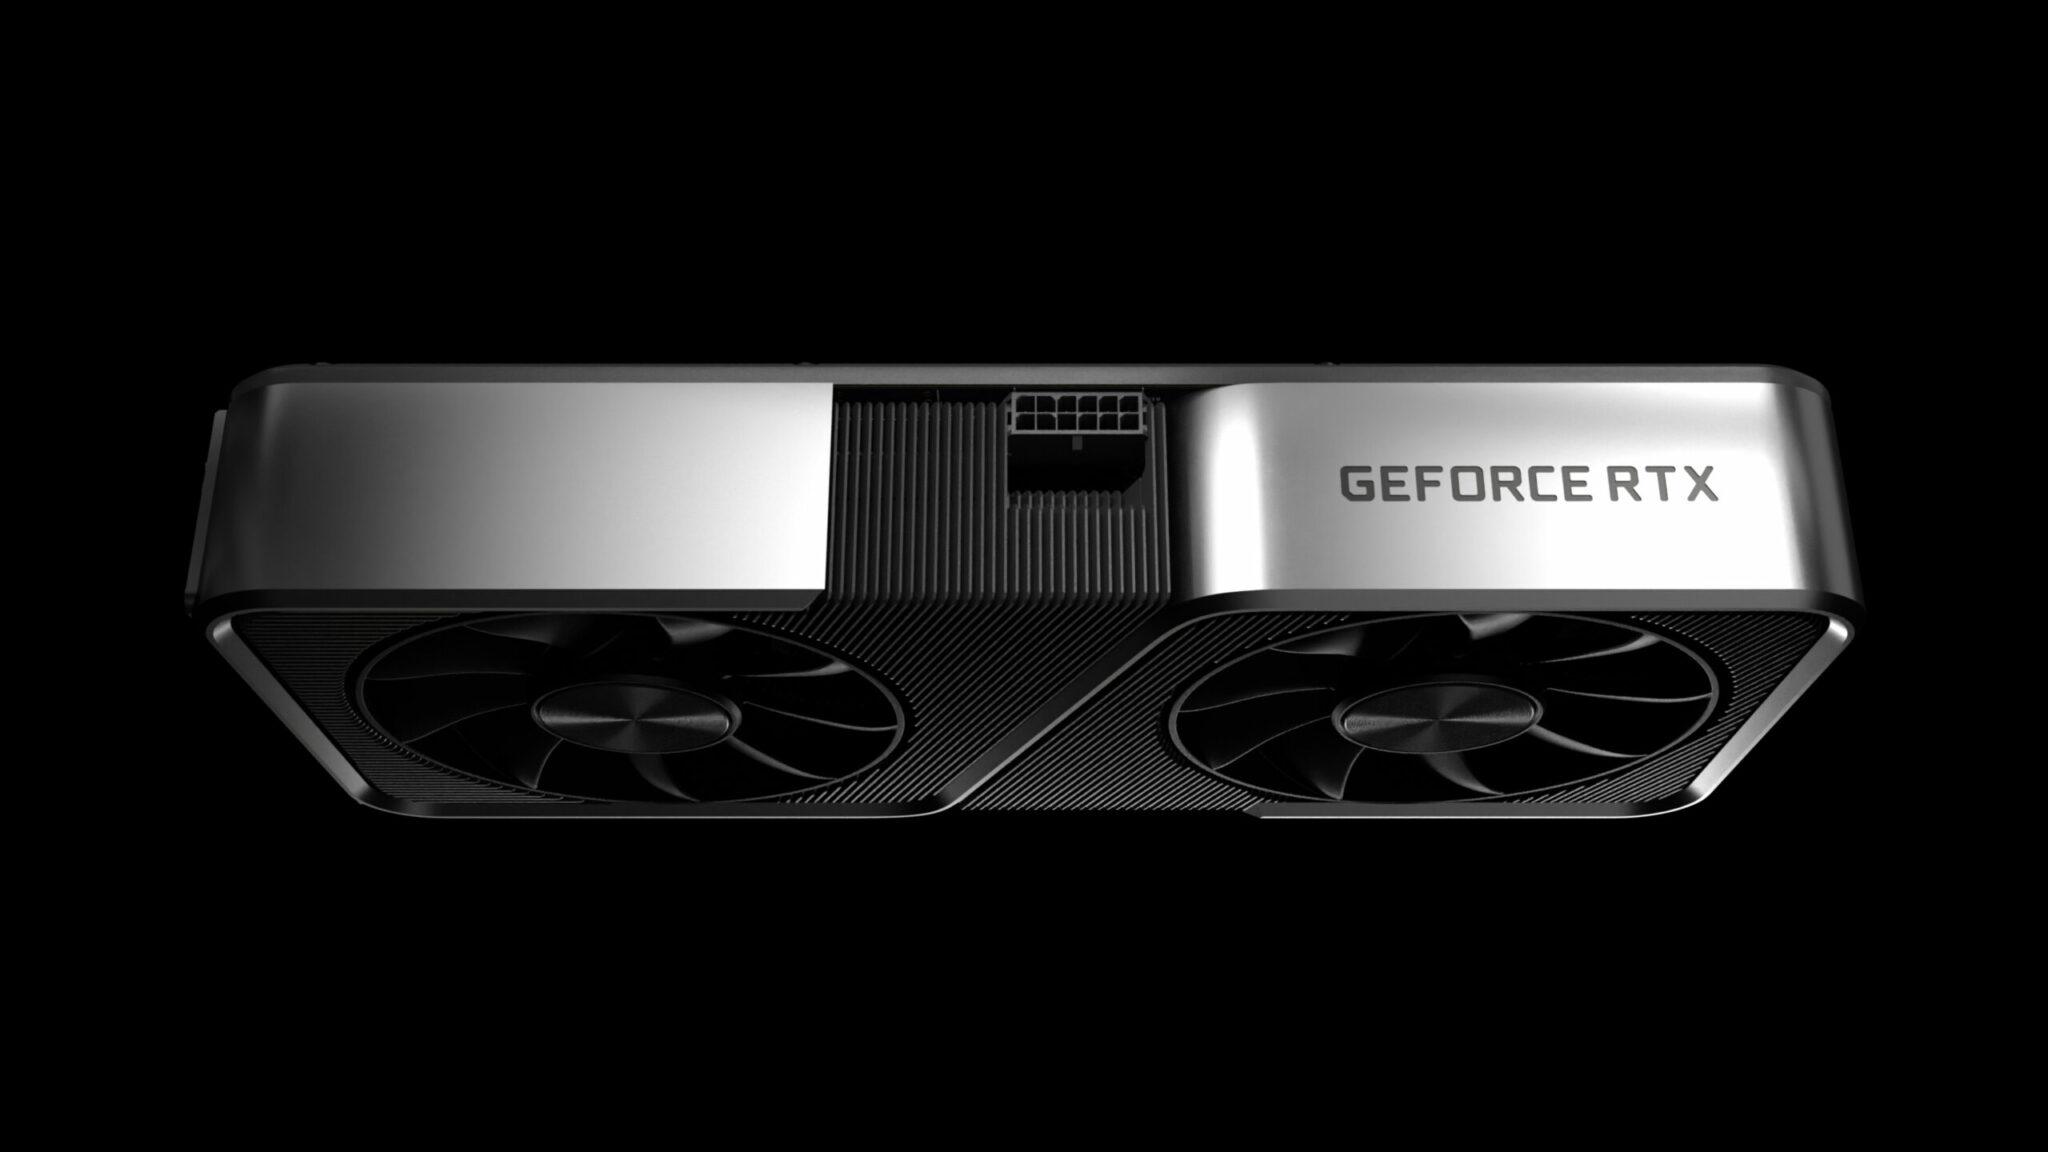 Neue Nvidia-Ampere-GPUs aufgetaucht: RTX 3080 20 GB, RTX 3070 SUPER/TI & RTX 3060